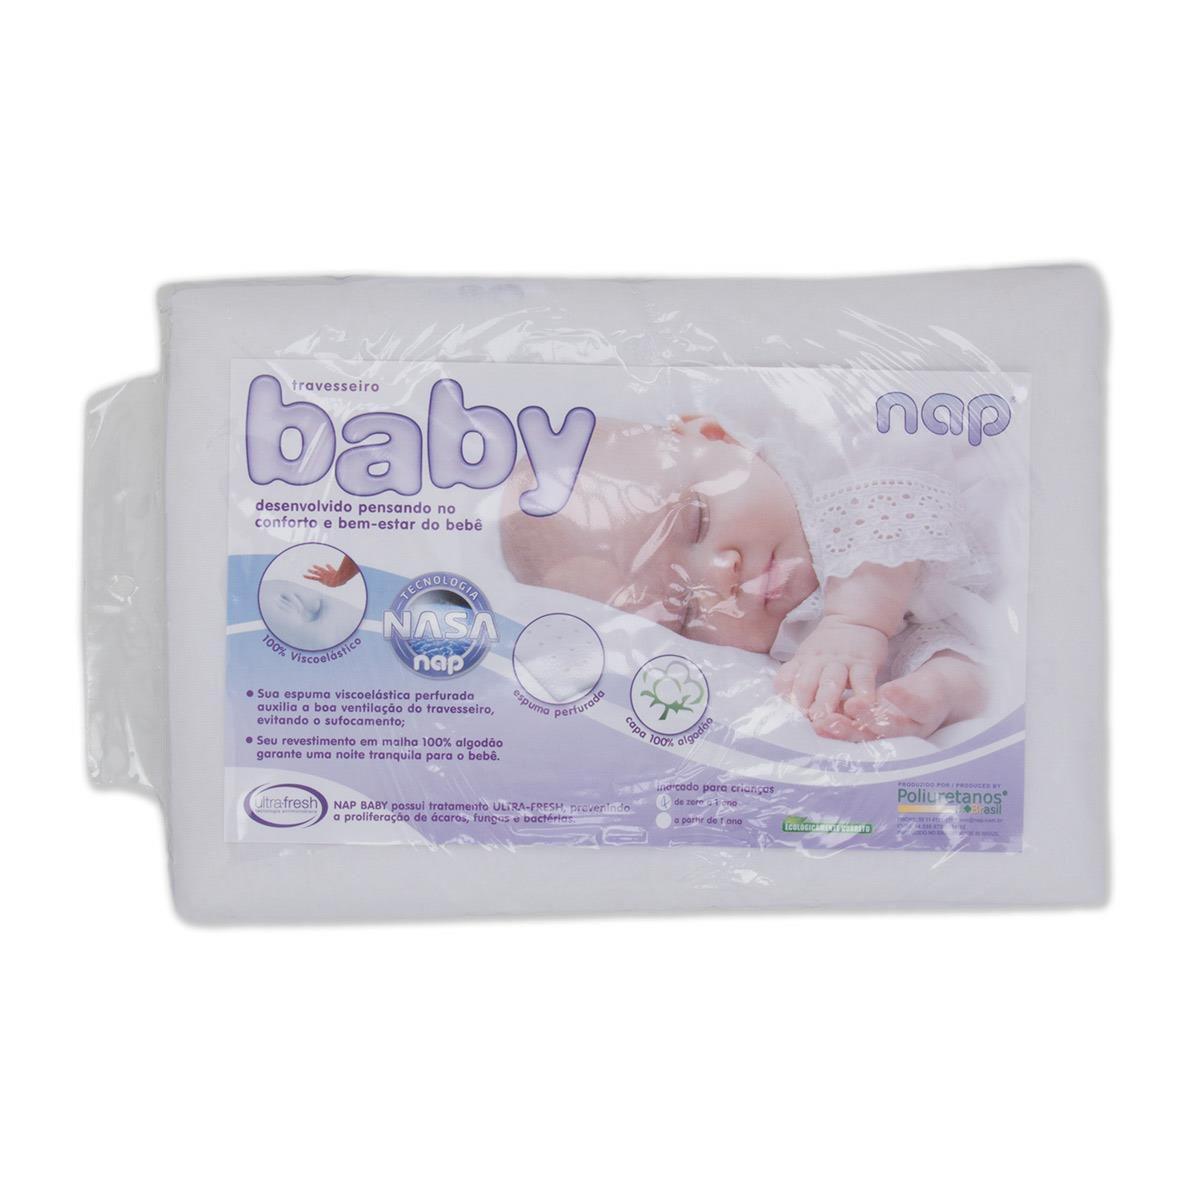 Travesseiro Nap Baby - Nasa